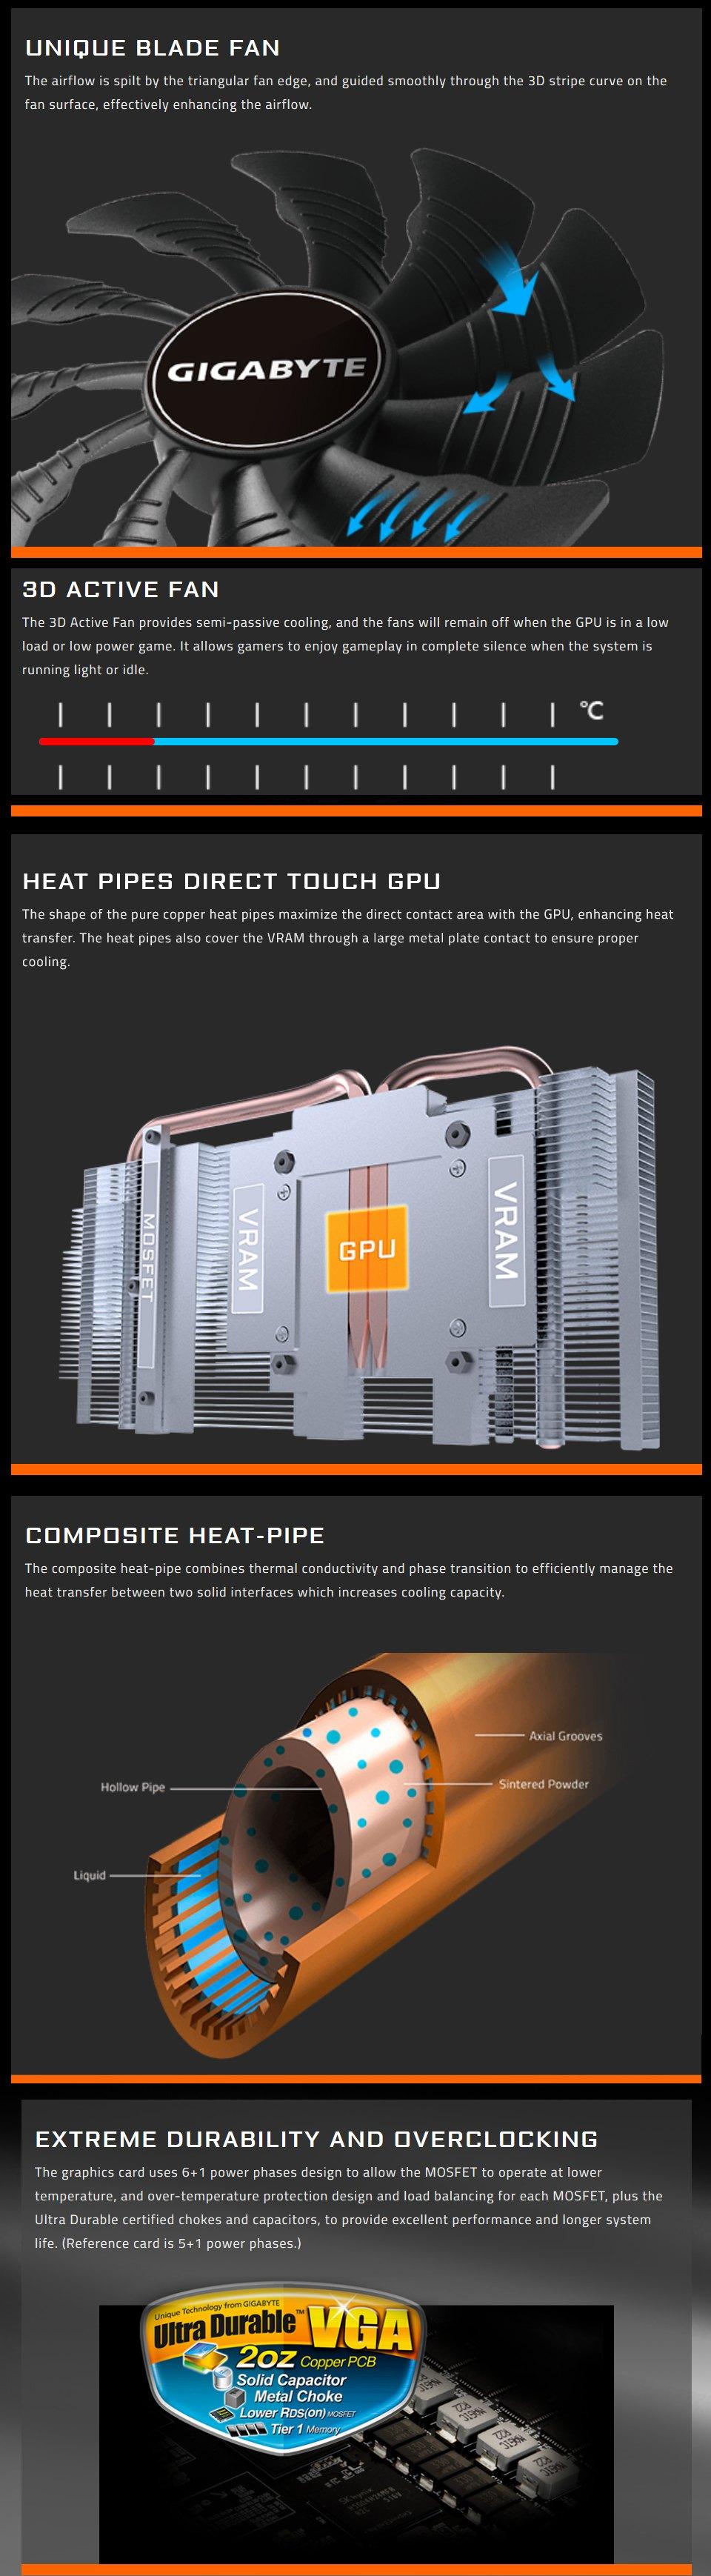 Gigabyte Radeon RX 5600 XT Windforce OC 6GB features 2